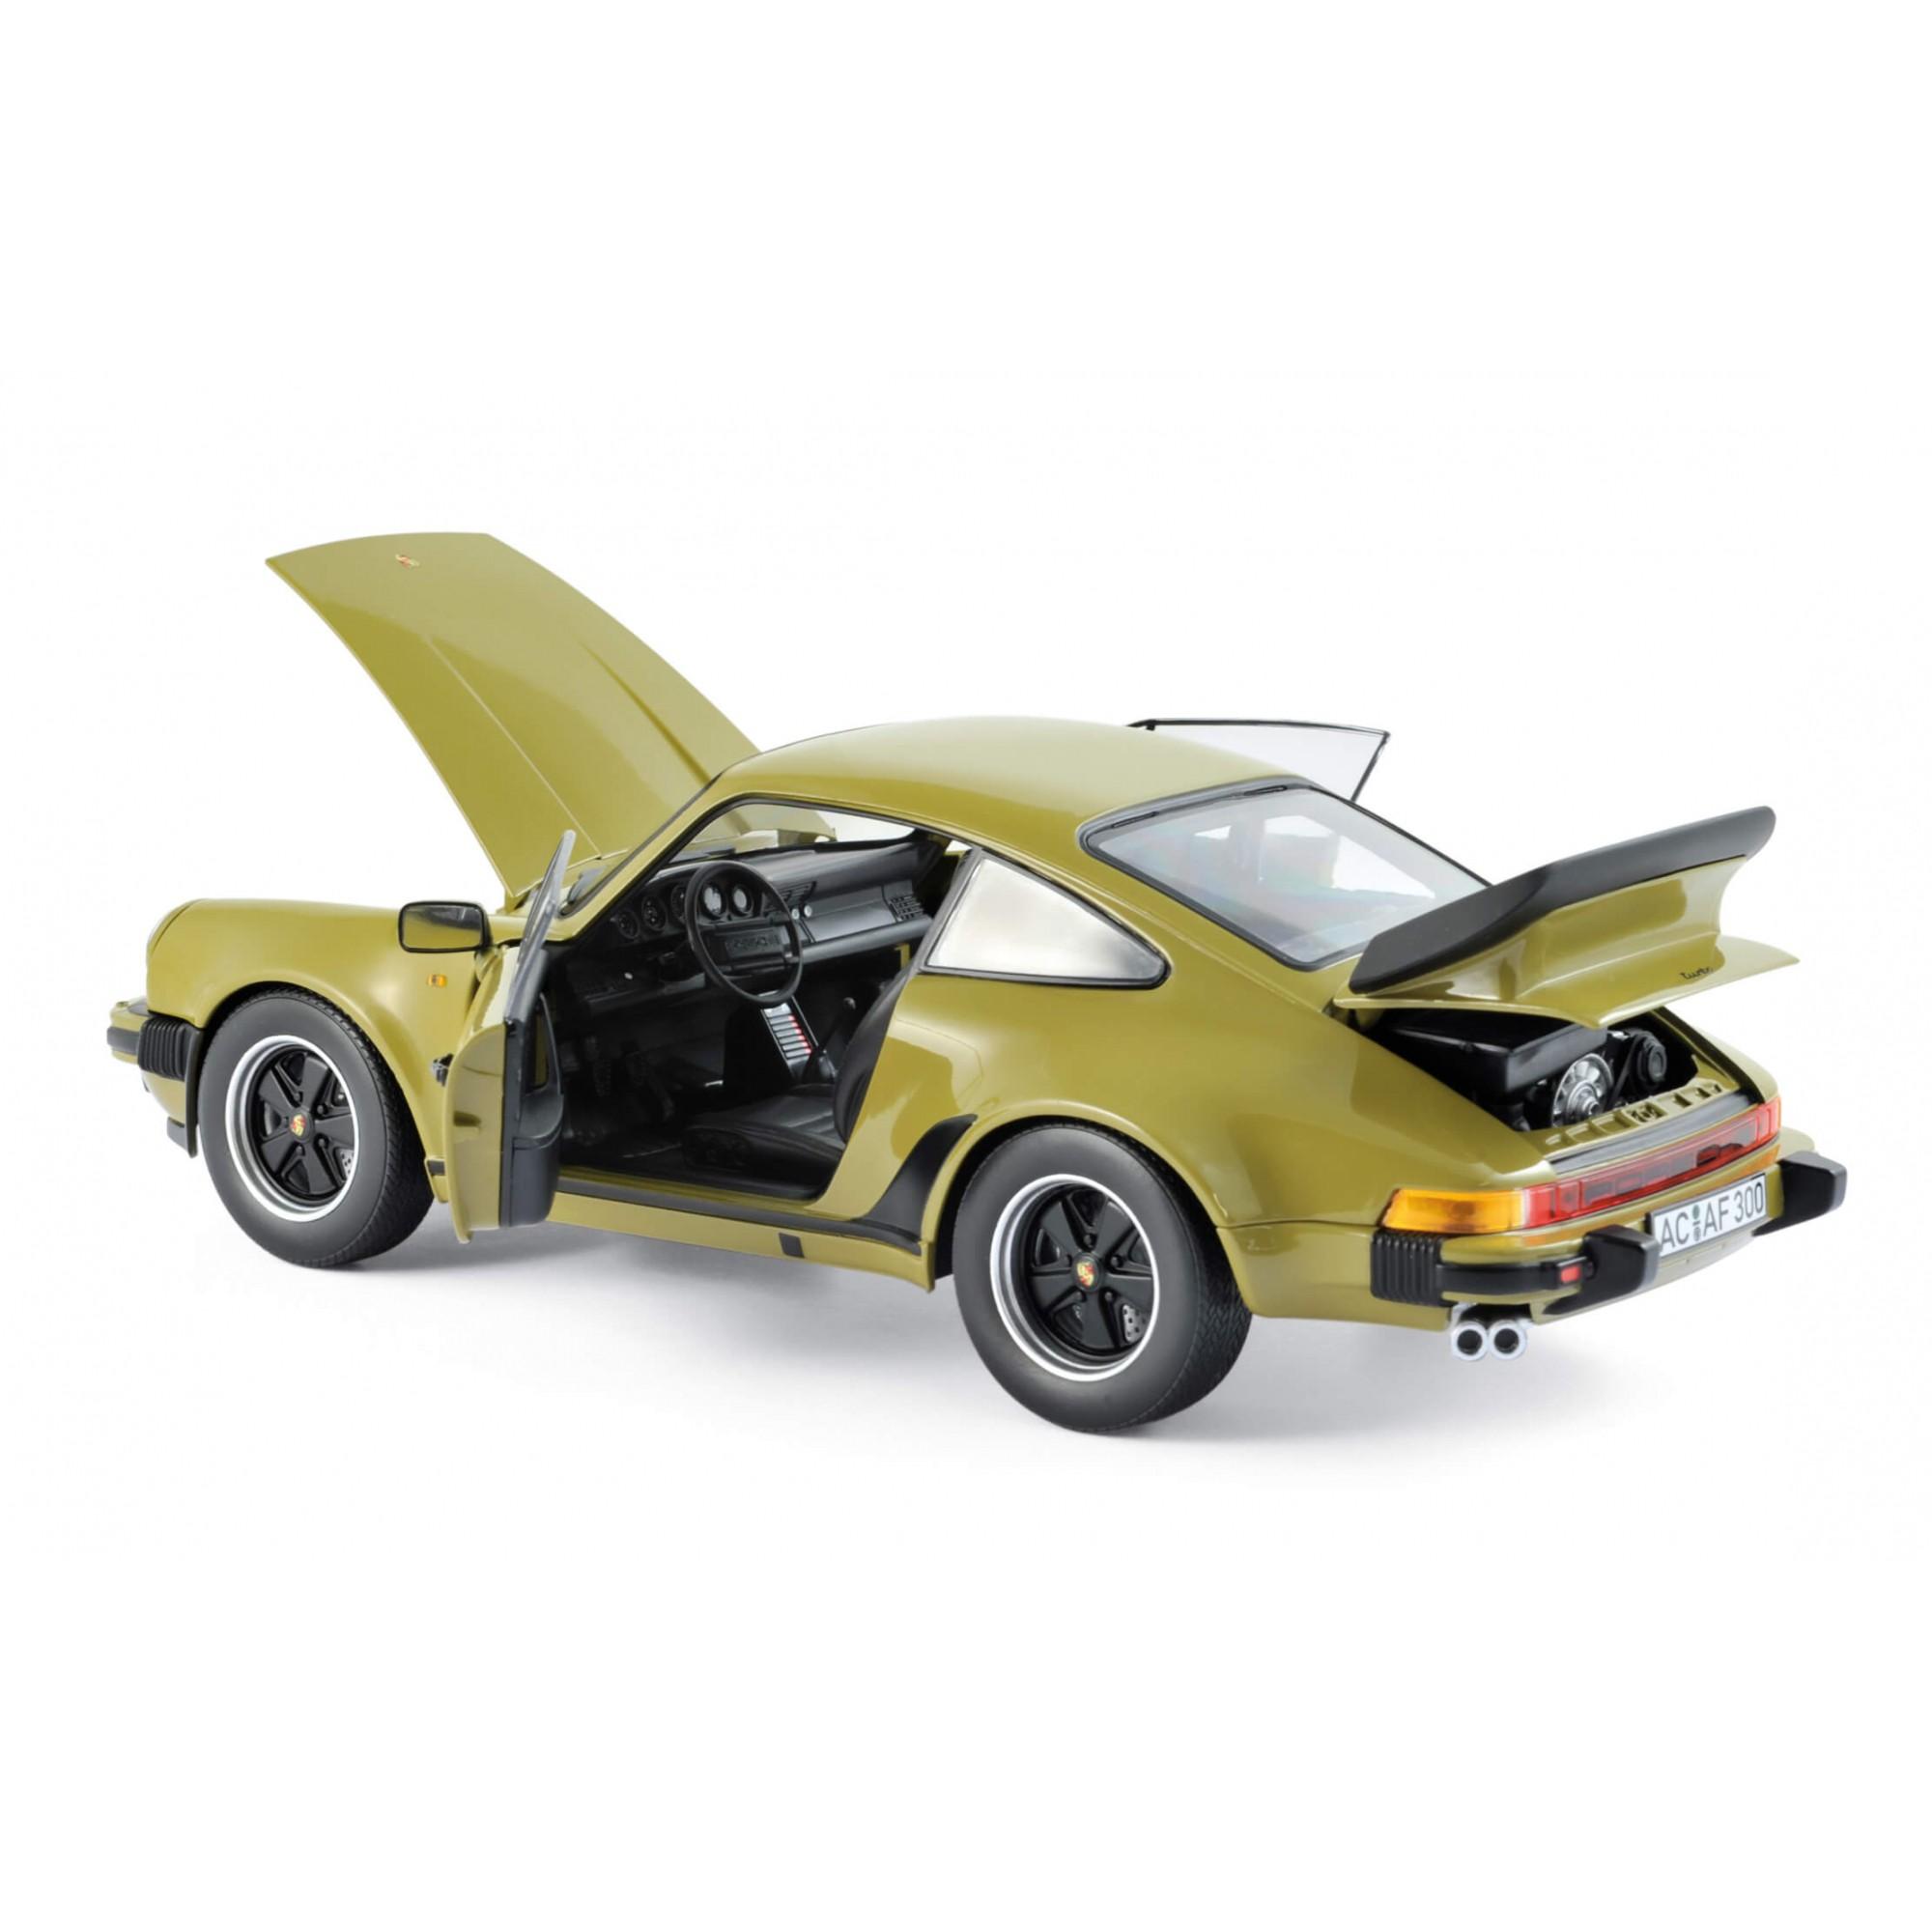 Miniatura Porsche 911 Turbo 3.3 1977 1/18 Norev